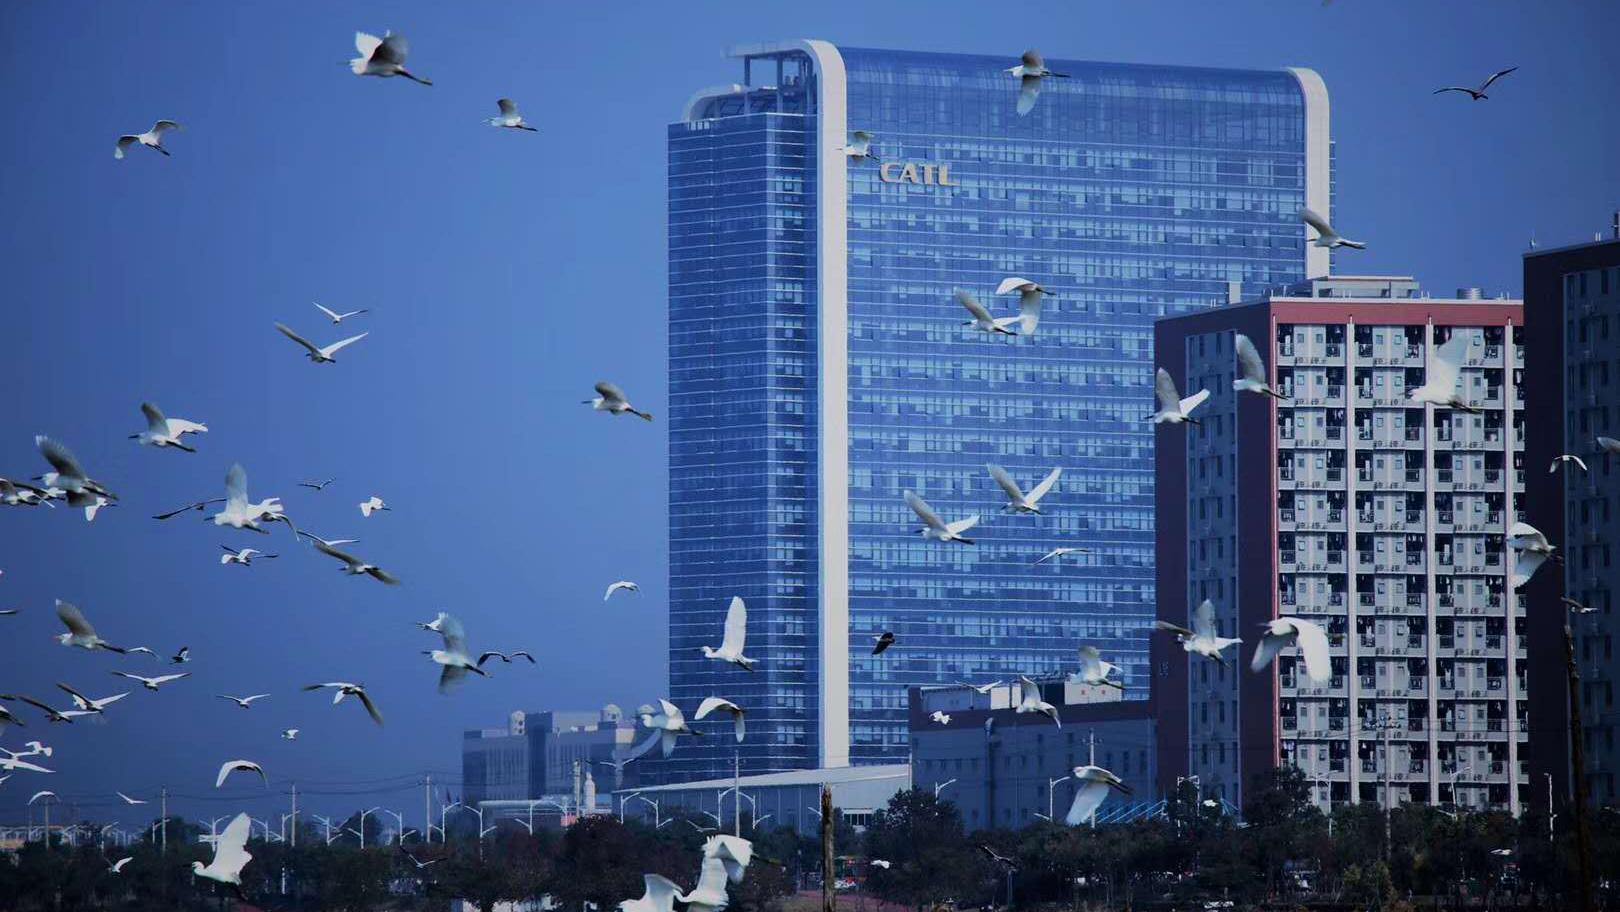 CATL's corporate headquarters in Ningde, China.